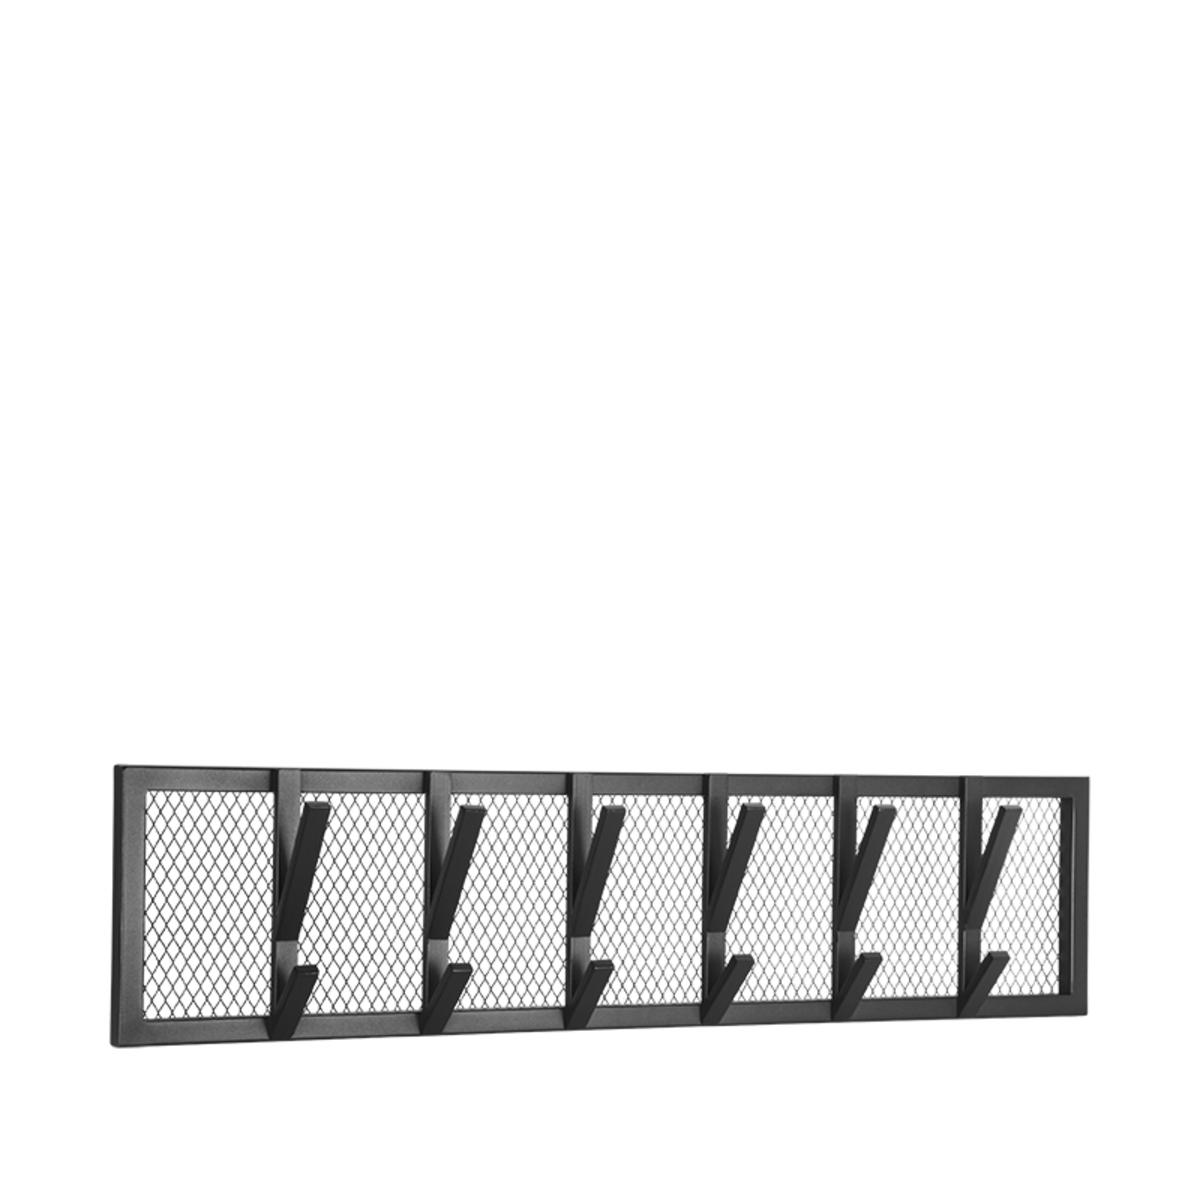 LABEL51 Kapstok Gruff - Zwart - Metaal - XL